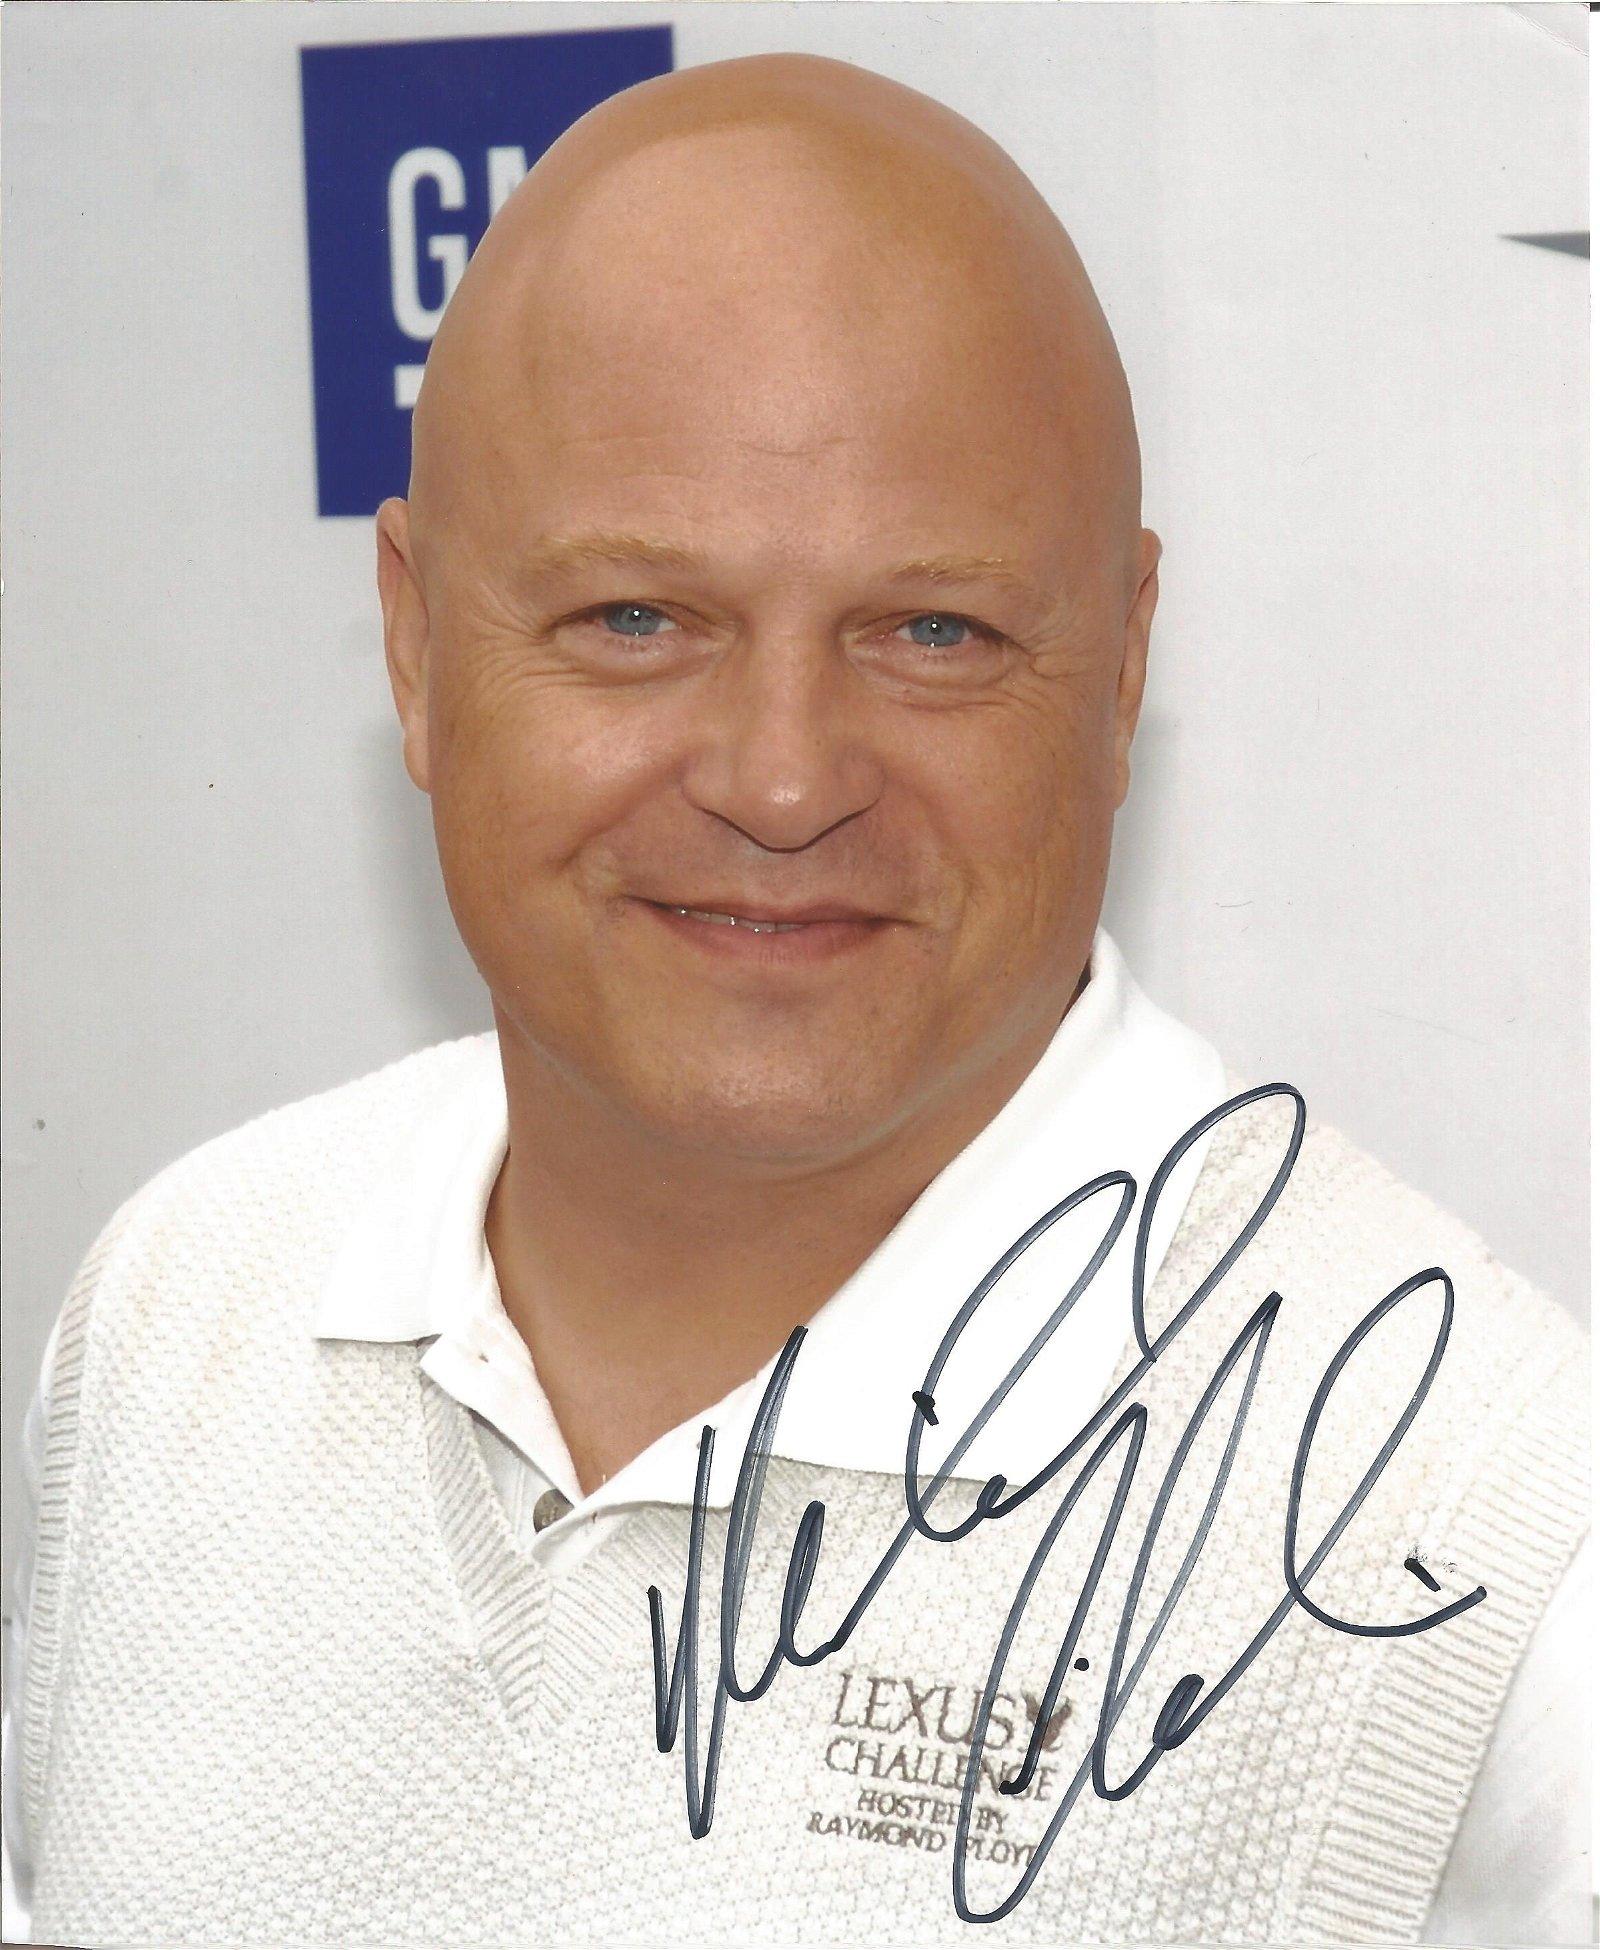 Michael Chiklis signed 10 x 8 colour Photoshoot